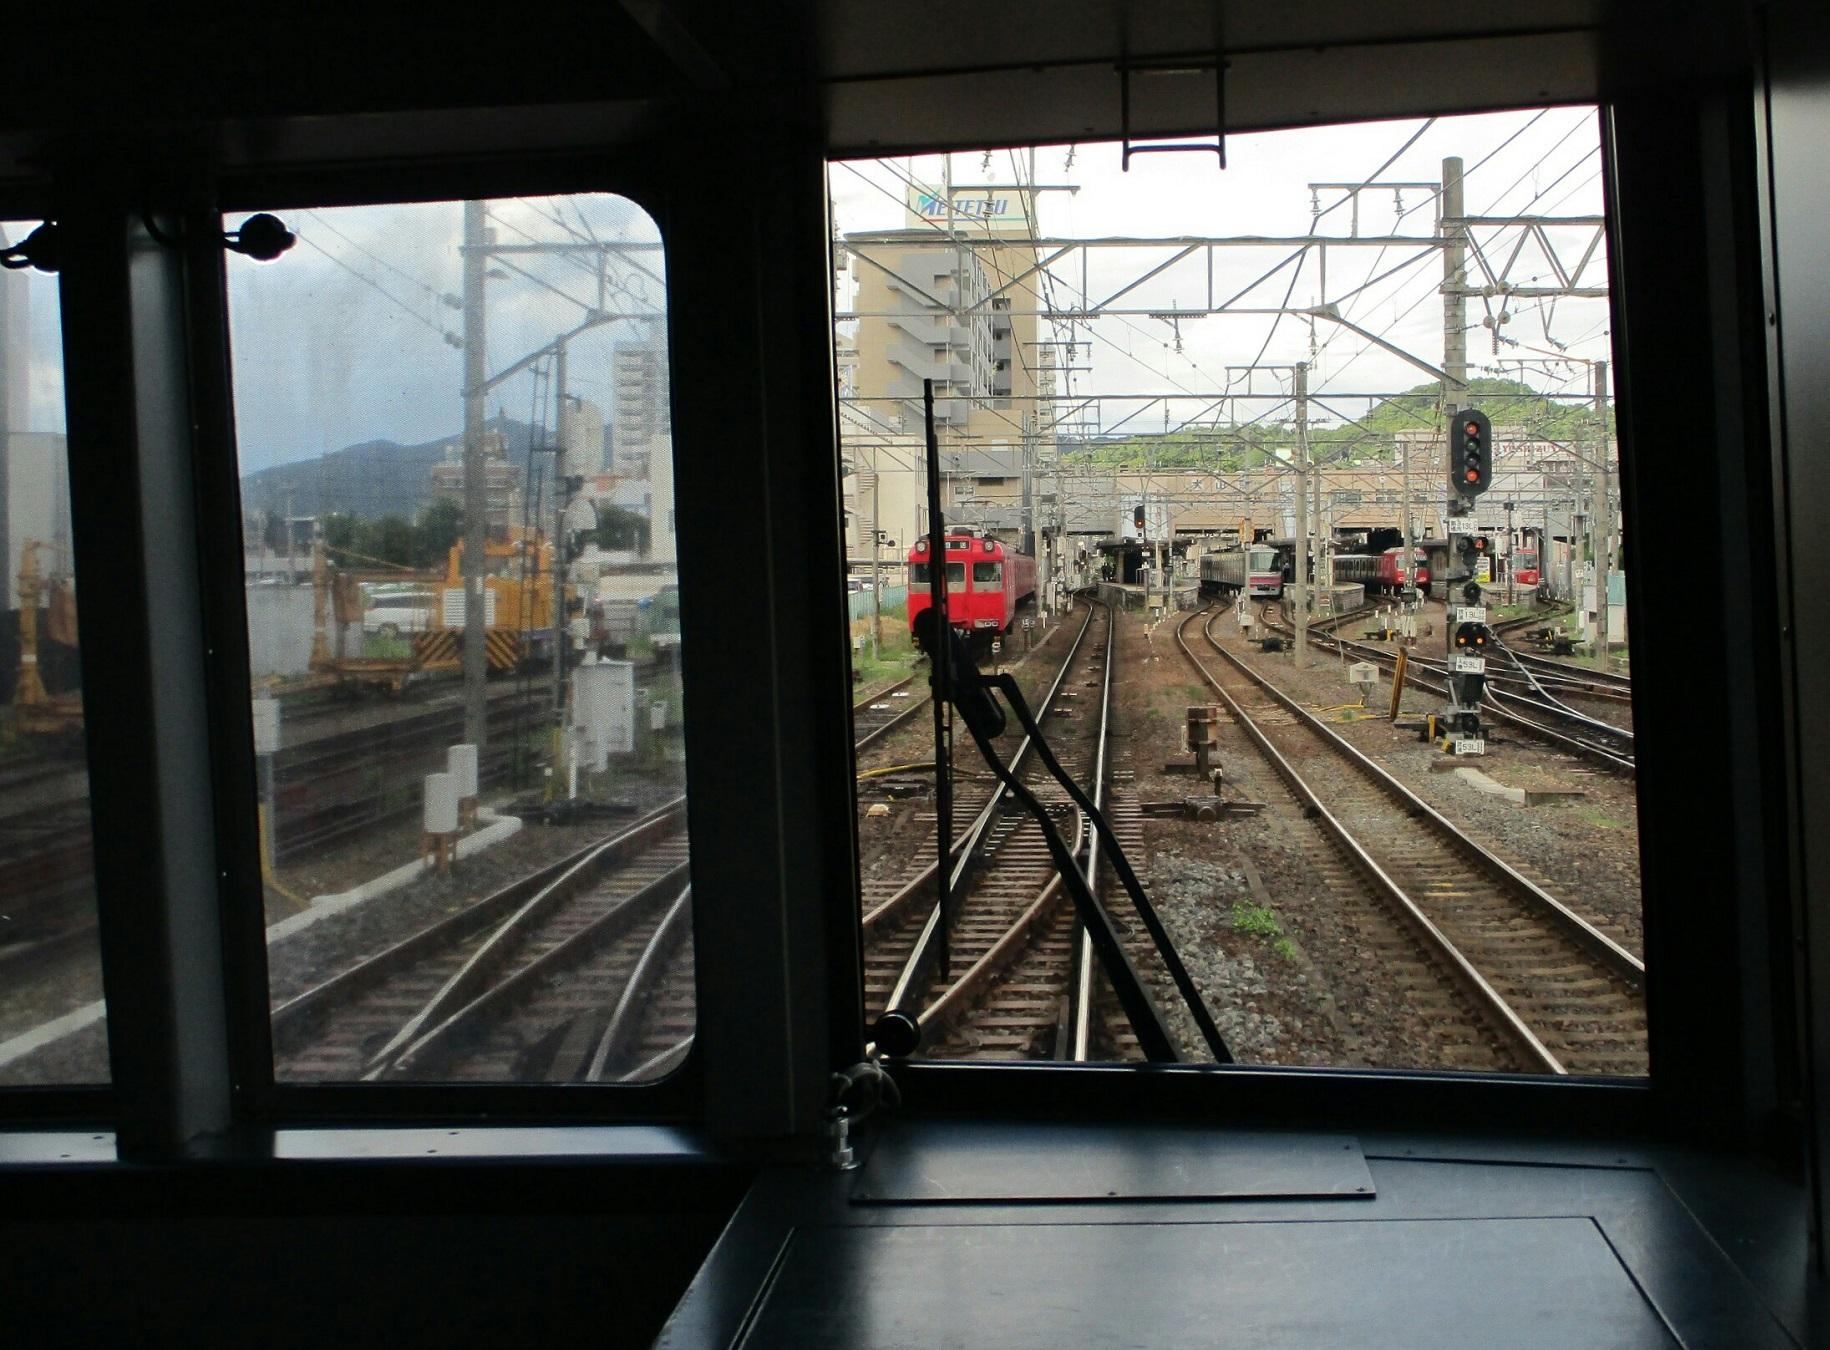 2018.6.30 (14) 新鵜沼いき快速特急 - 犬山 1830-1350